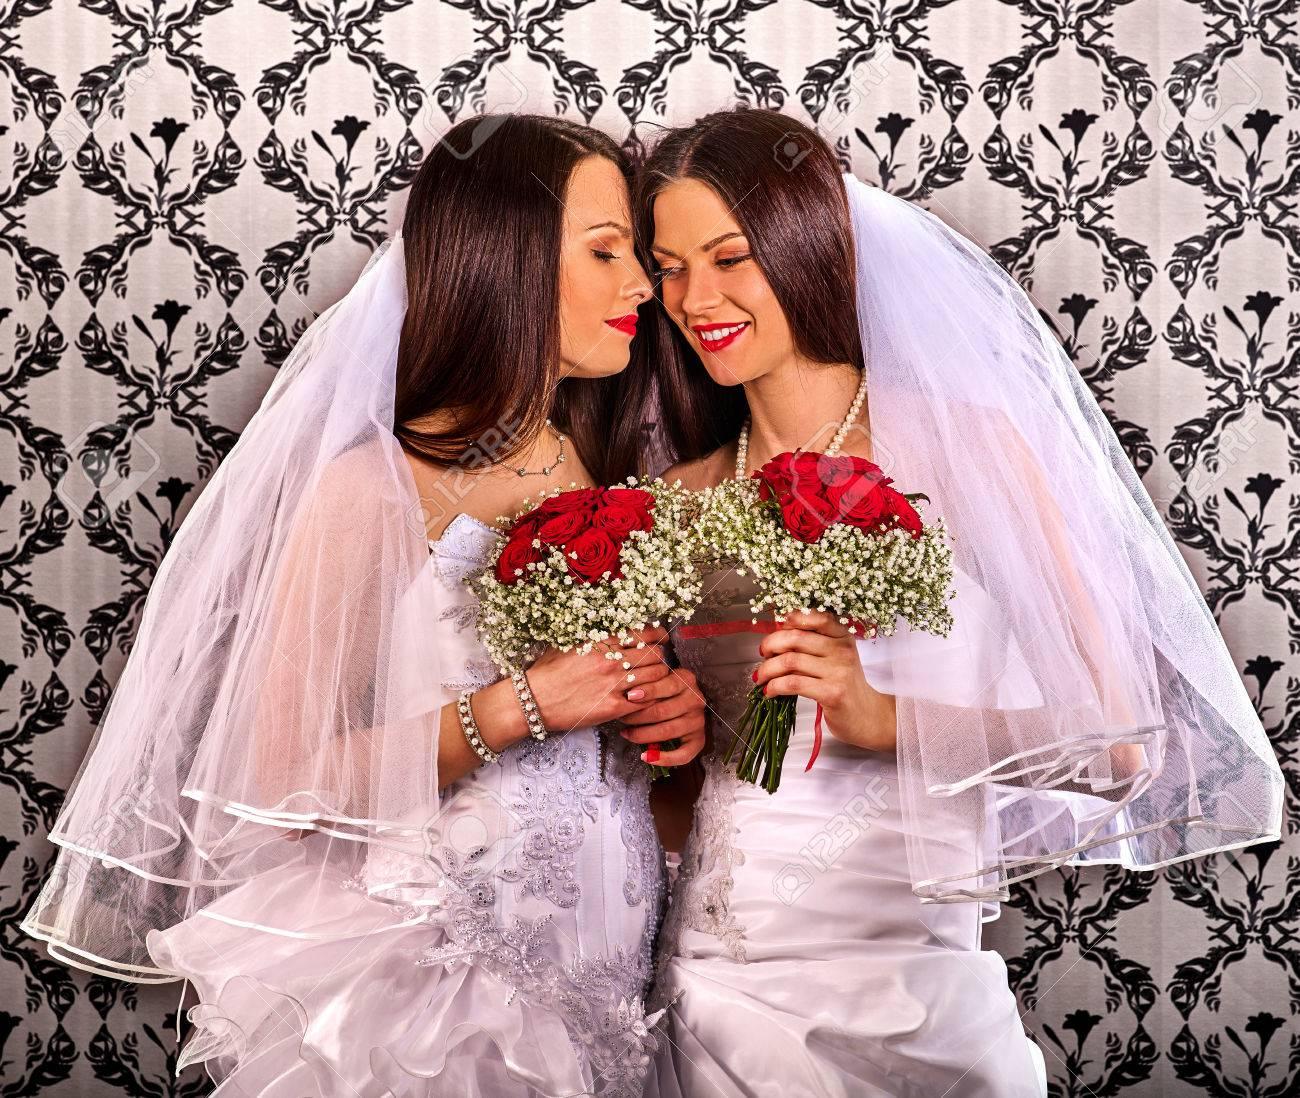 baisers lesbienne sexe